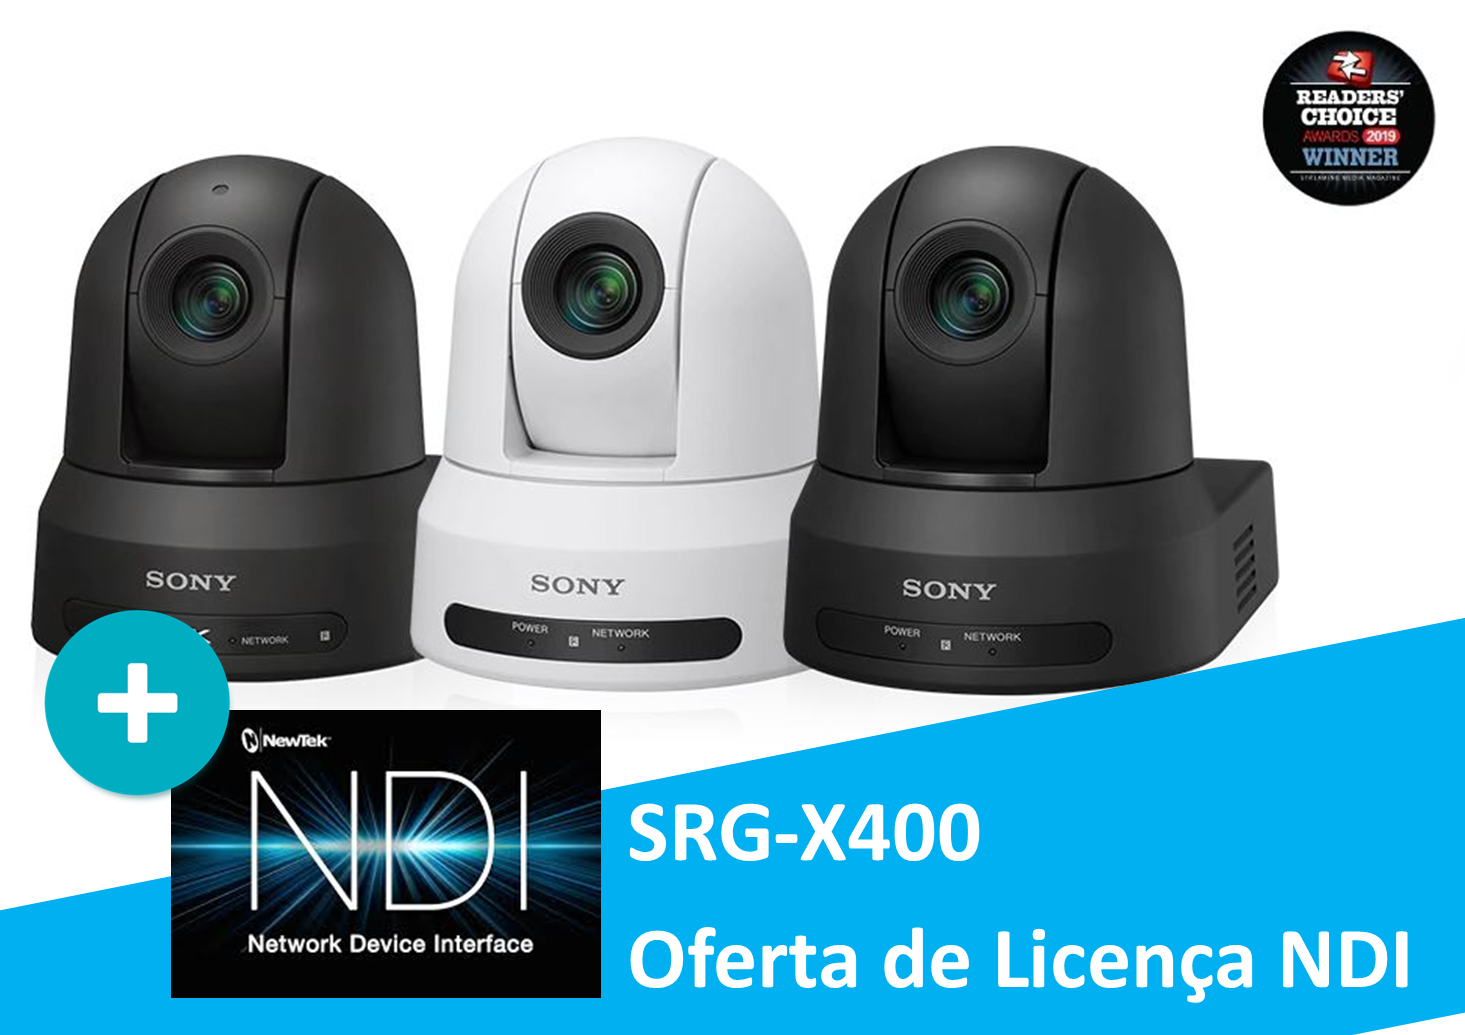 Sony SRG-X400 - Inclui Oferta Licença NDI